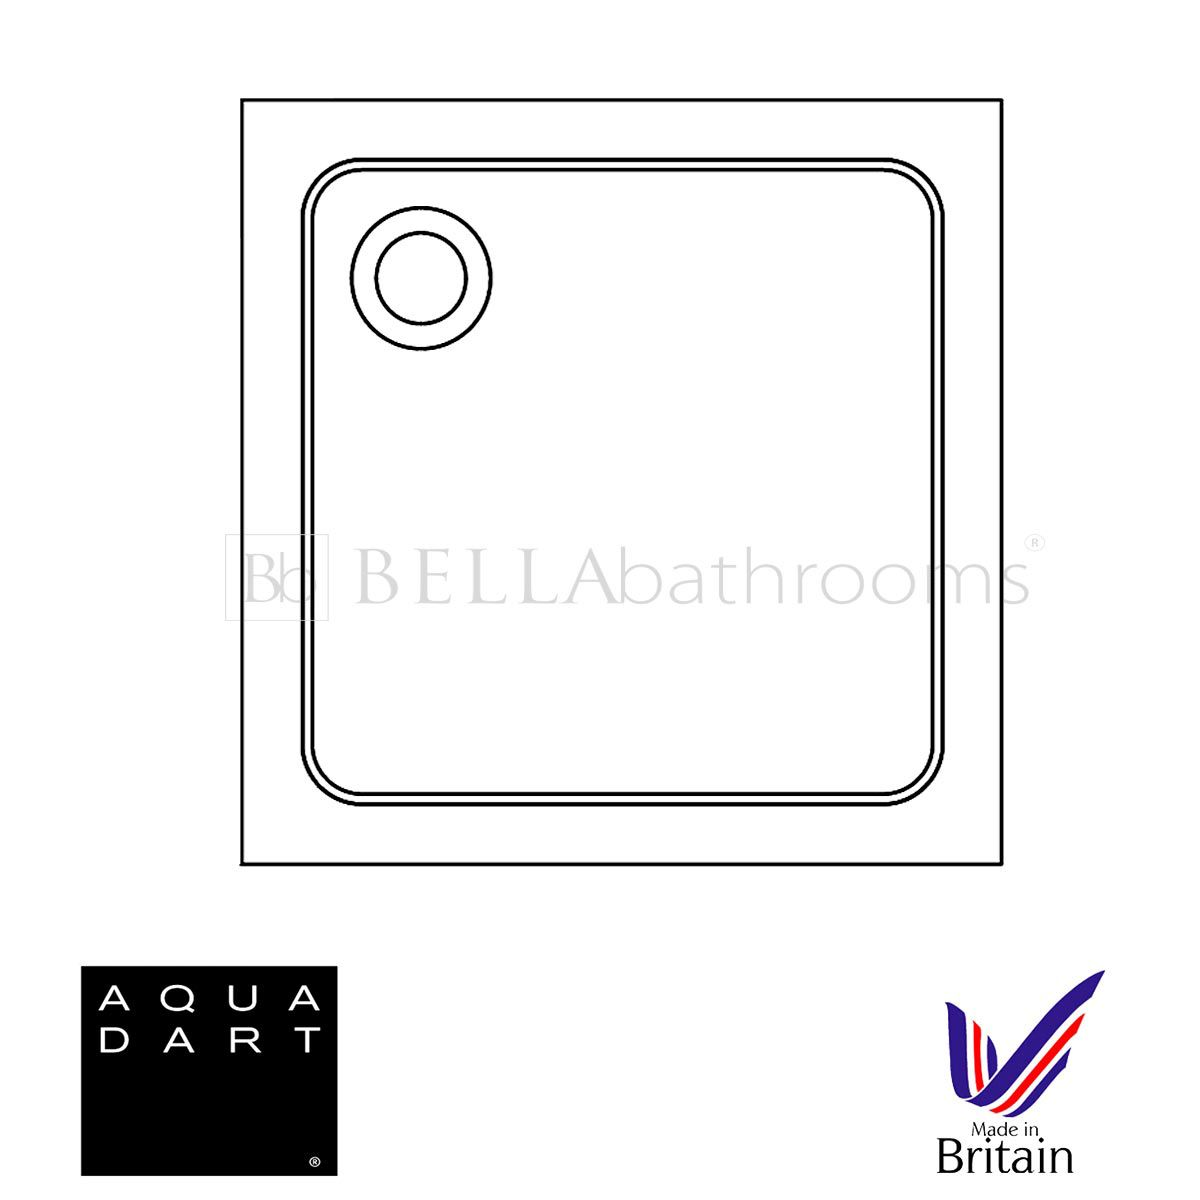 Aquadart Square 760 x 760 Shower Tray